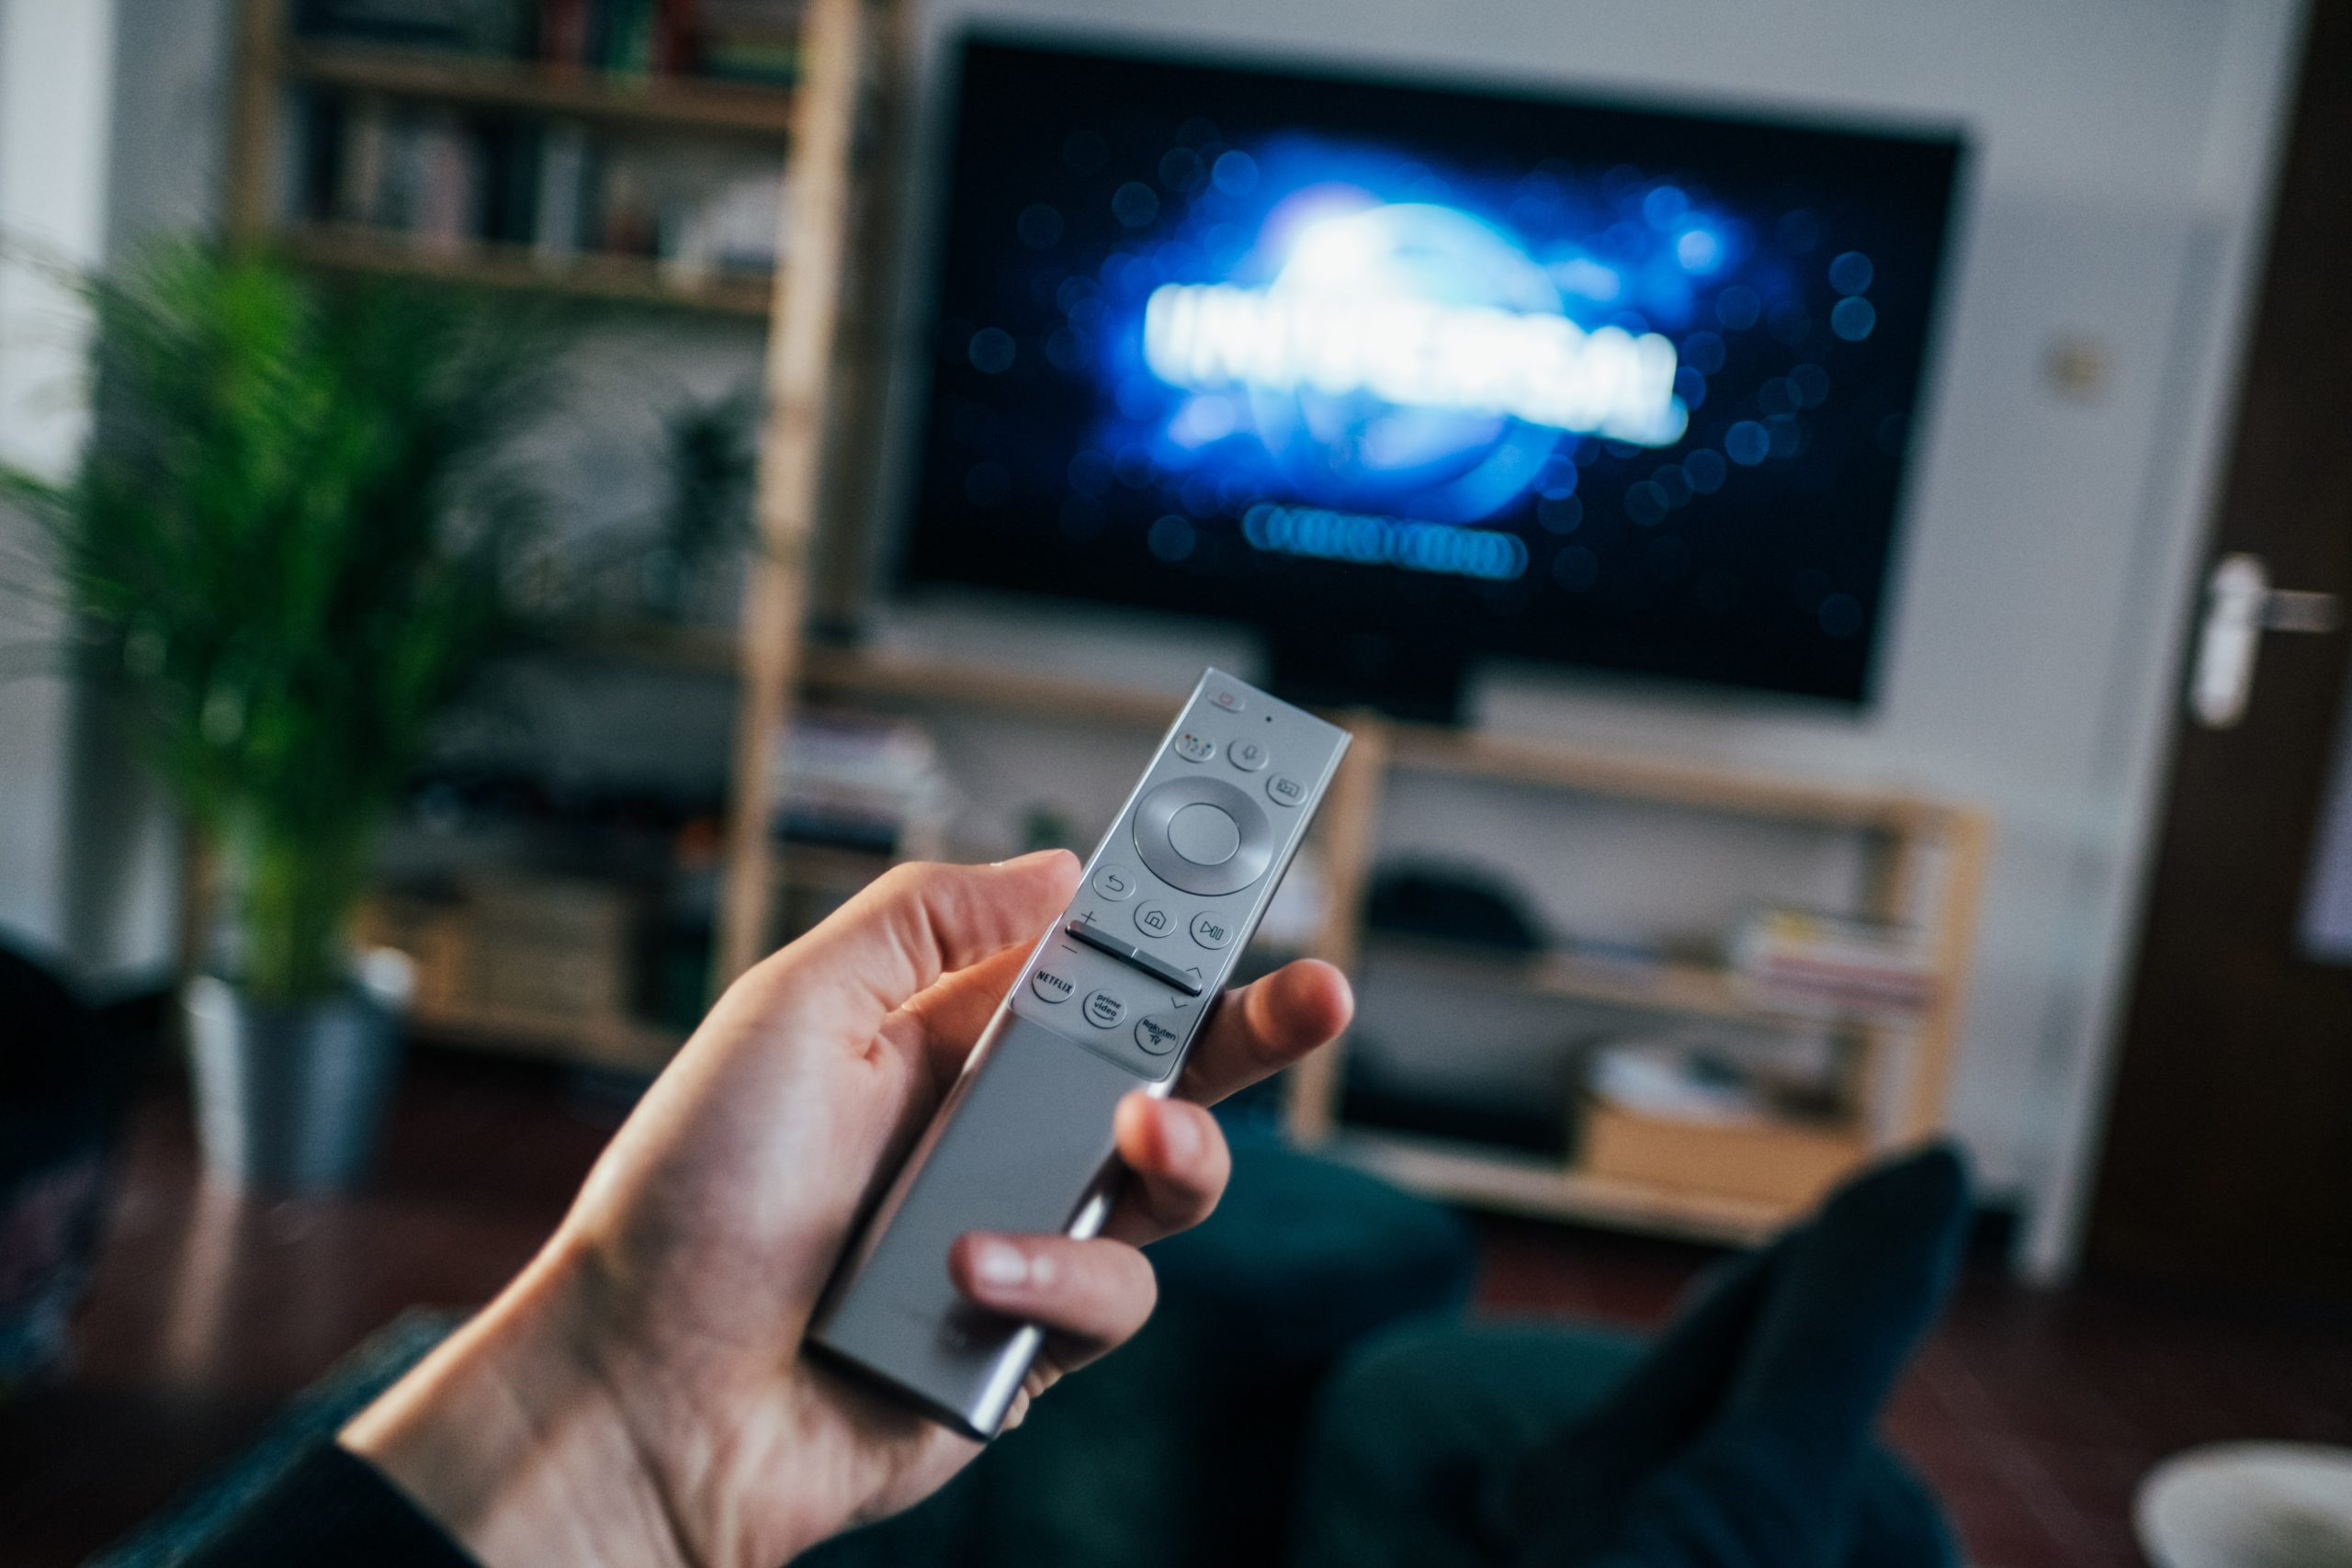 smart tv samsung supprimer les pubs